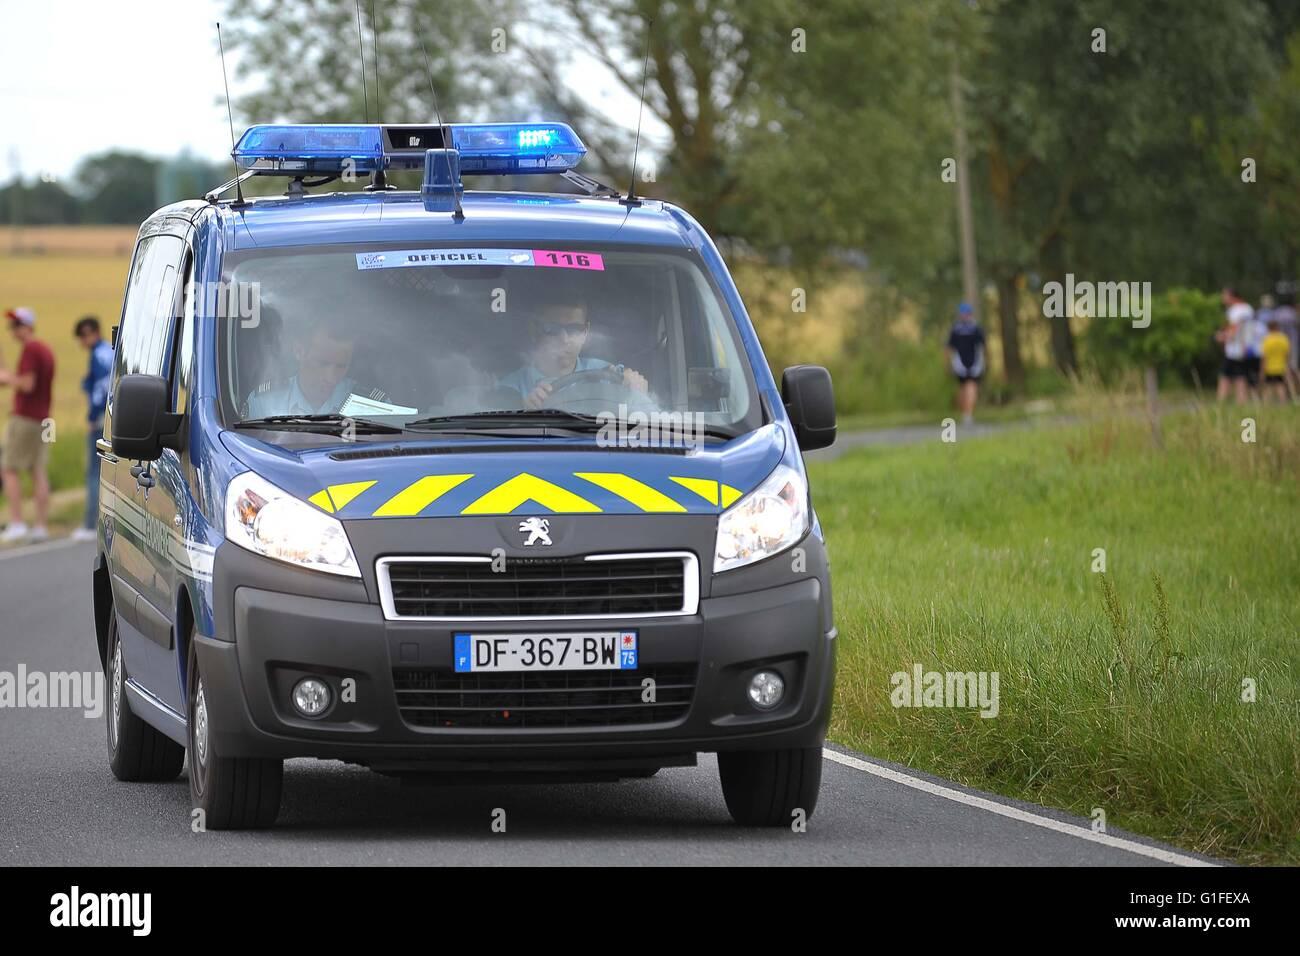 Peugeot van blue with blue lights on top security escort for peleton peugeot van blue with blue lights on top security escort for peleton of tour de france uk aloadofball Image collections